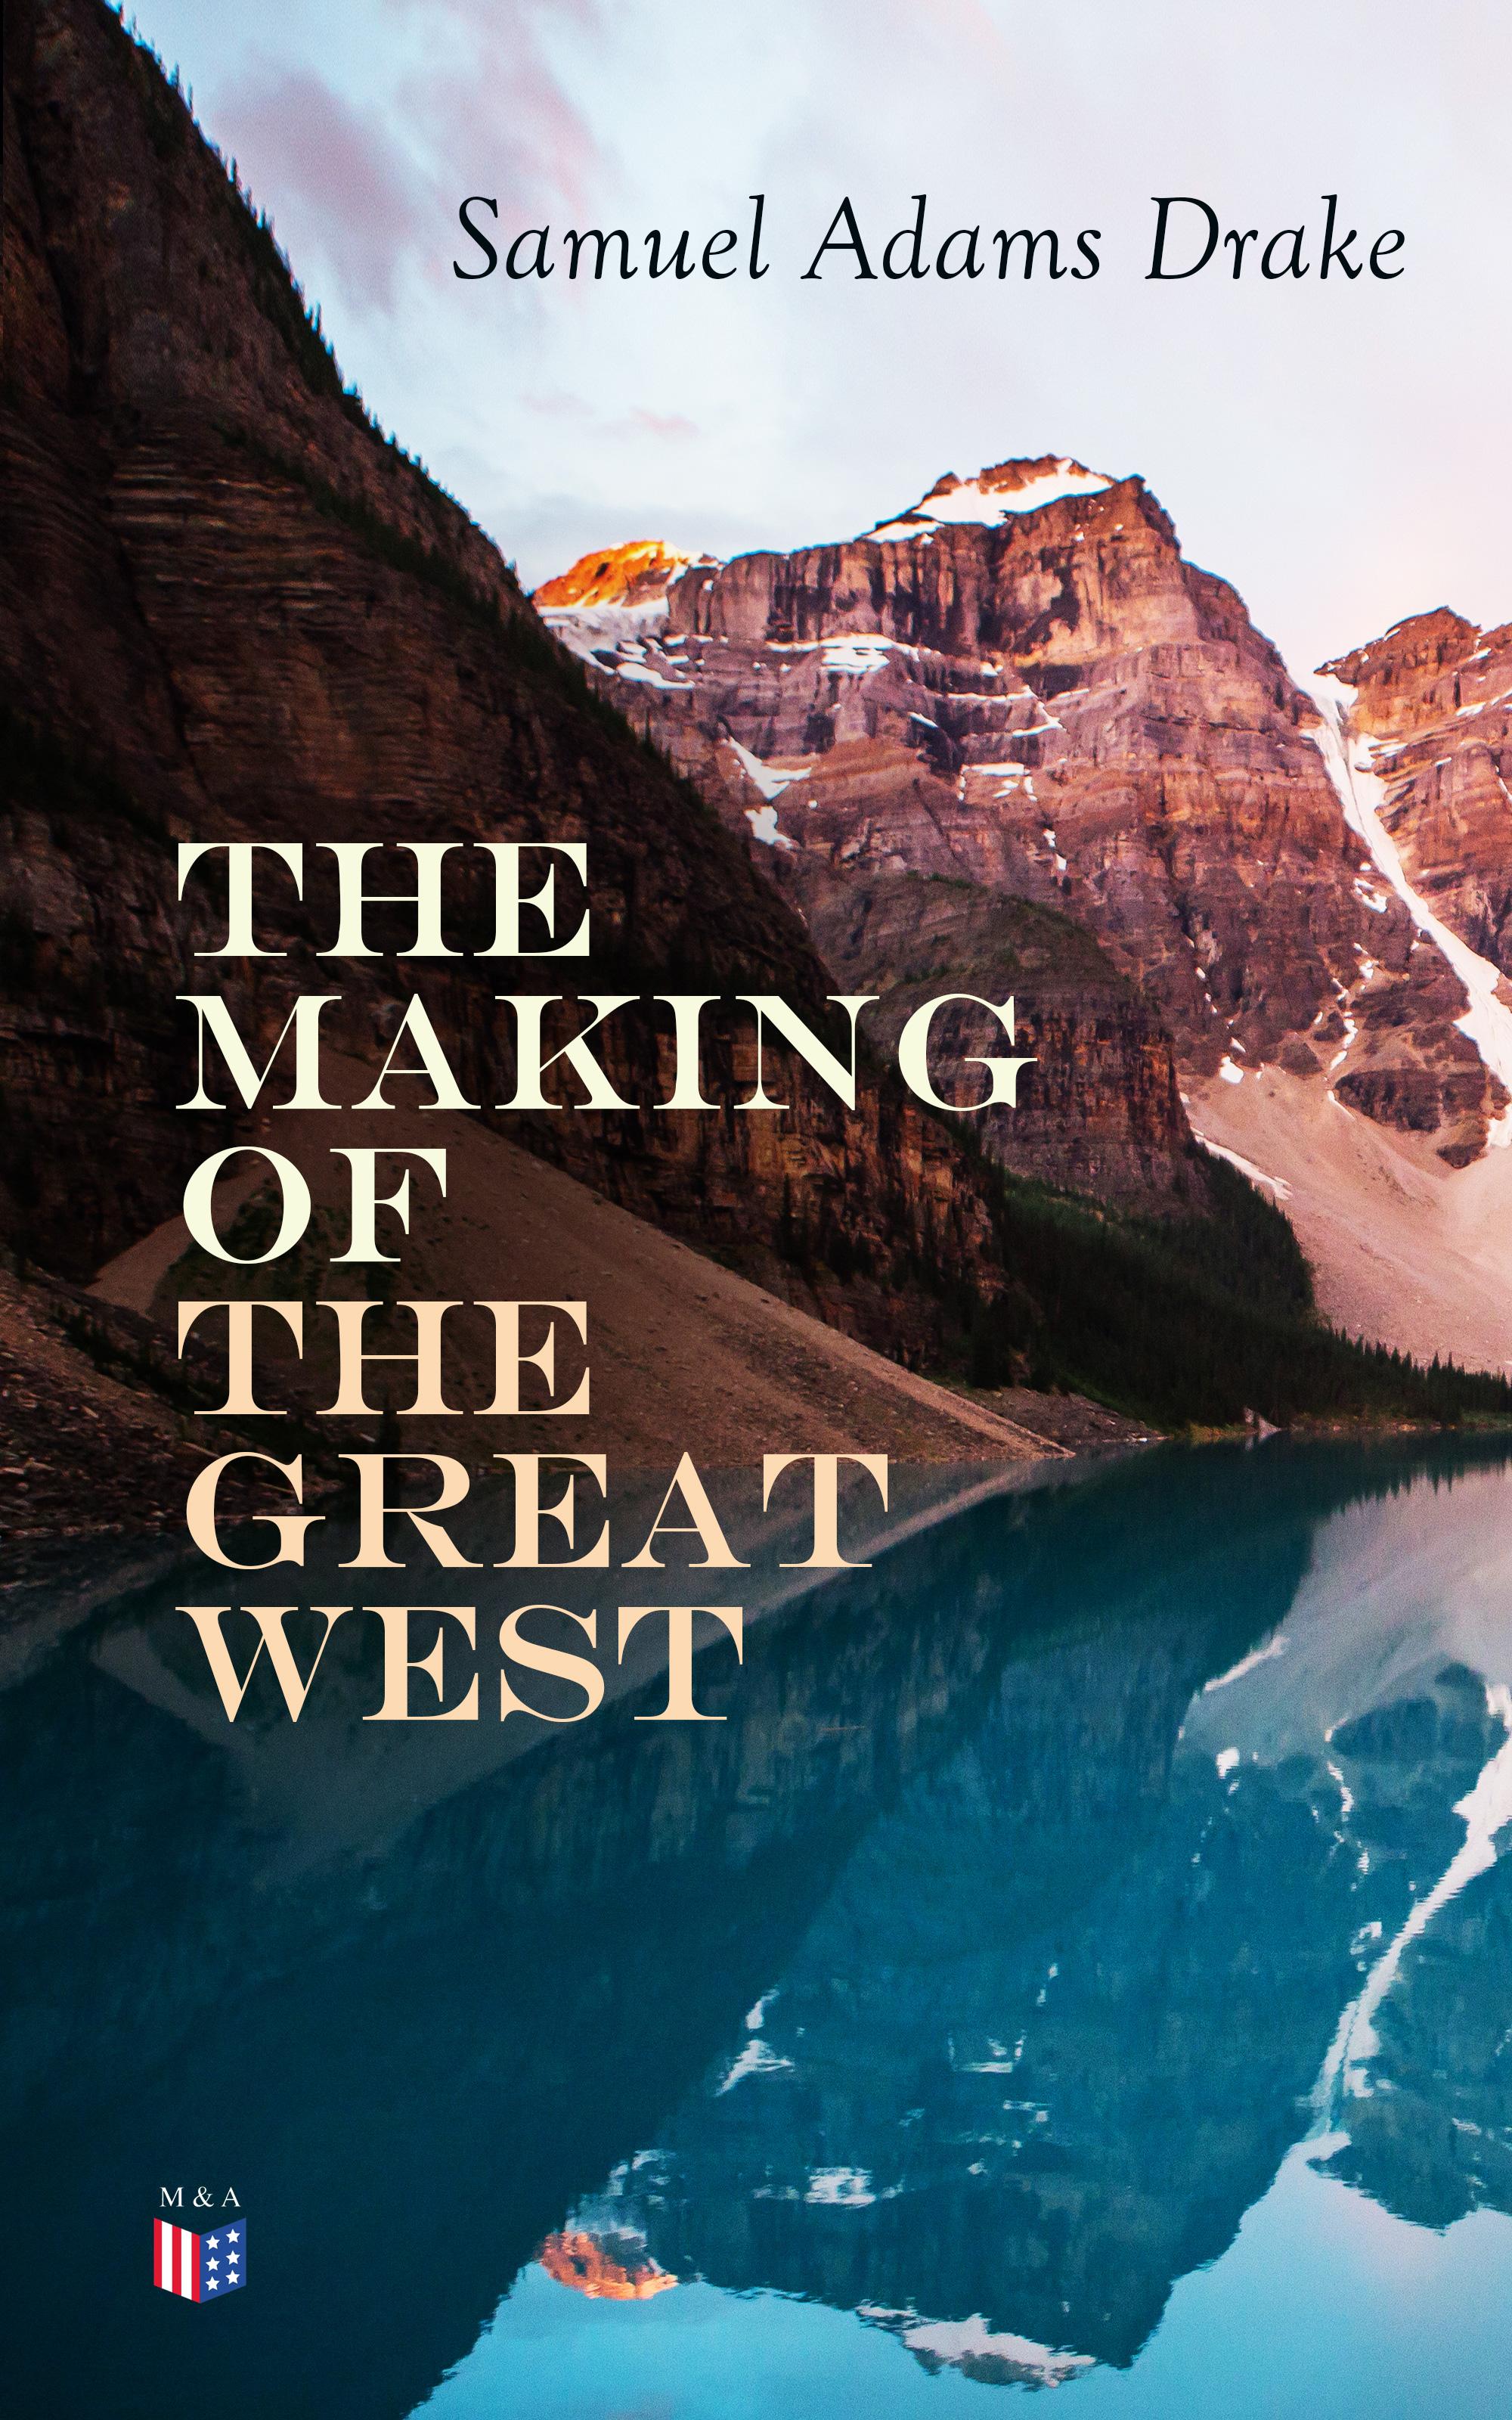 цена на Samuel Adams Drake The Making of the Great West